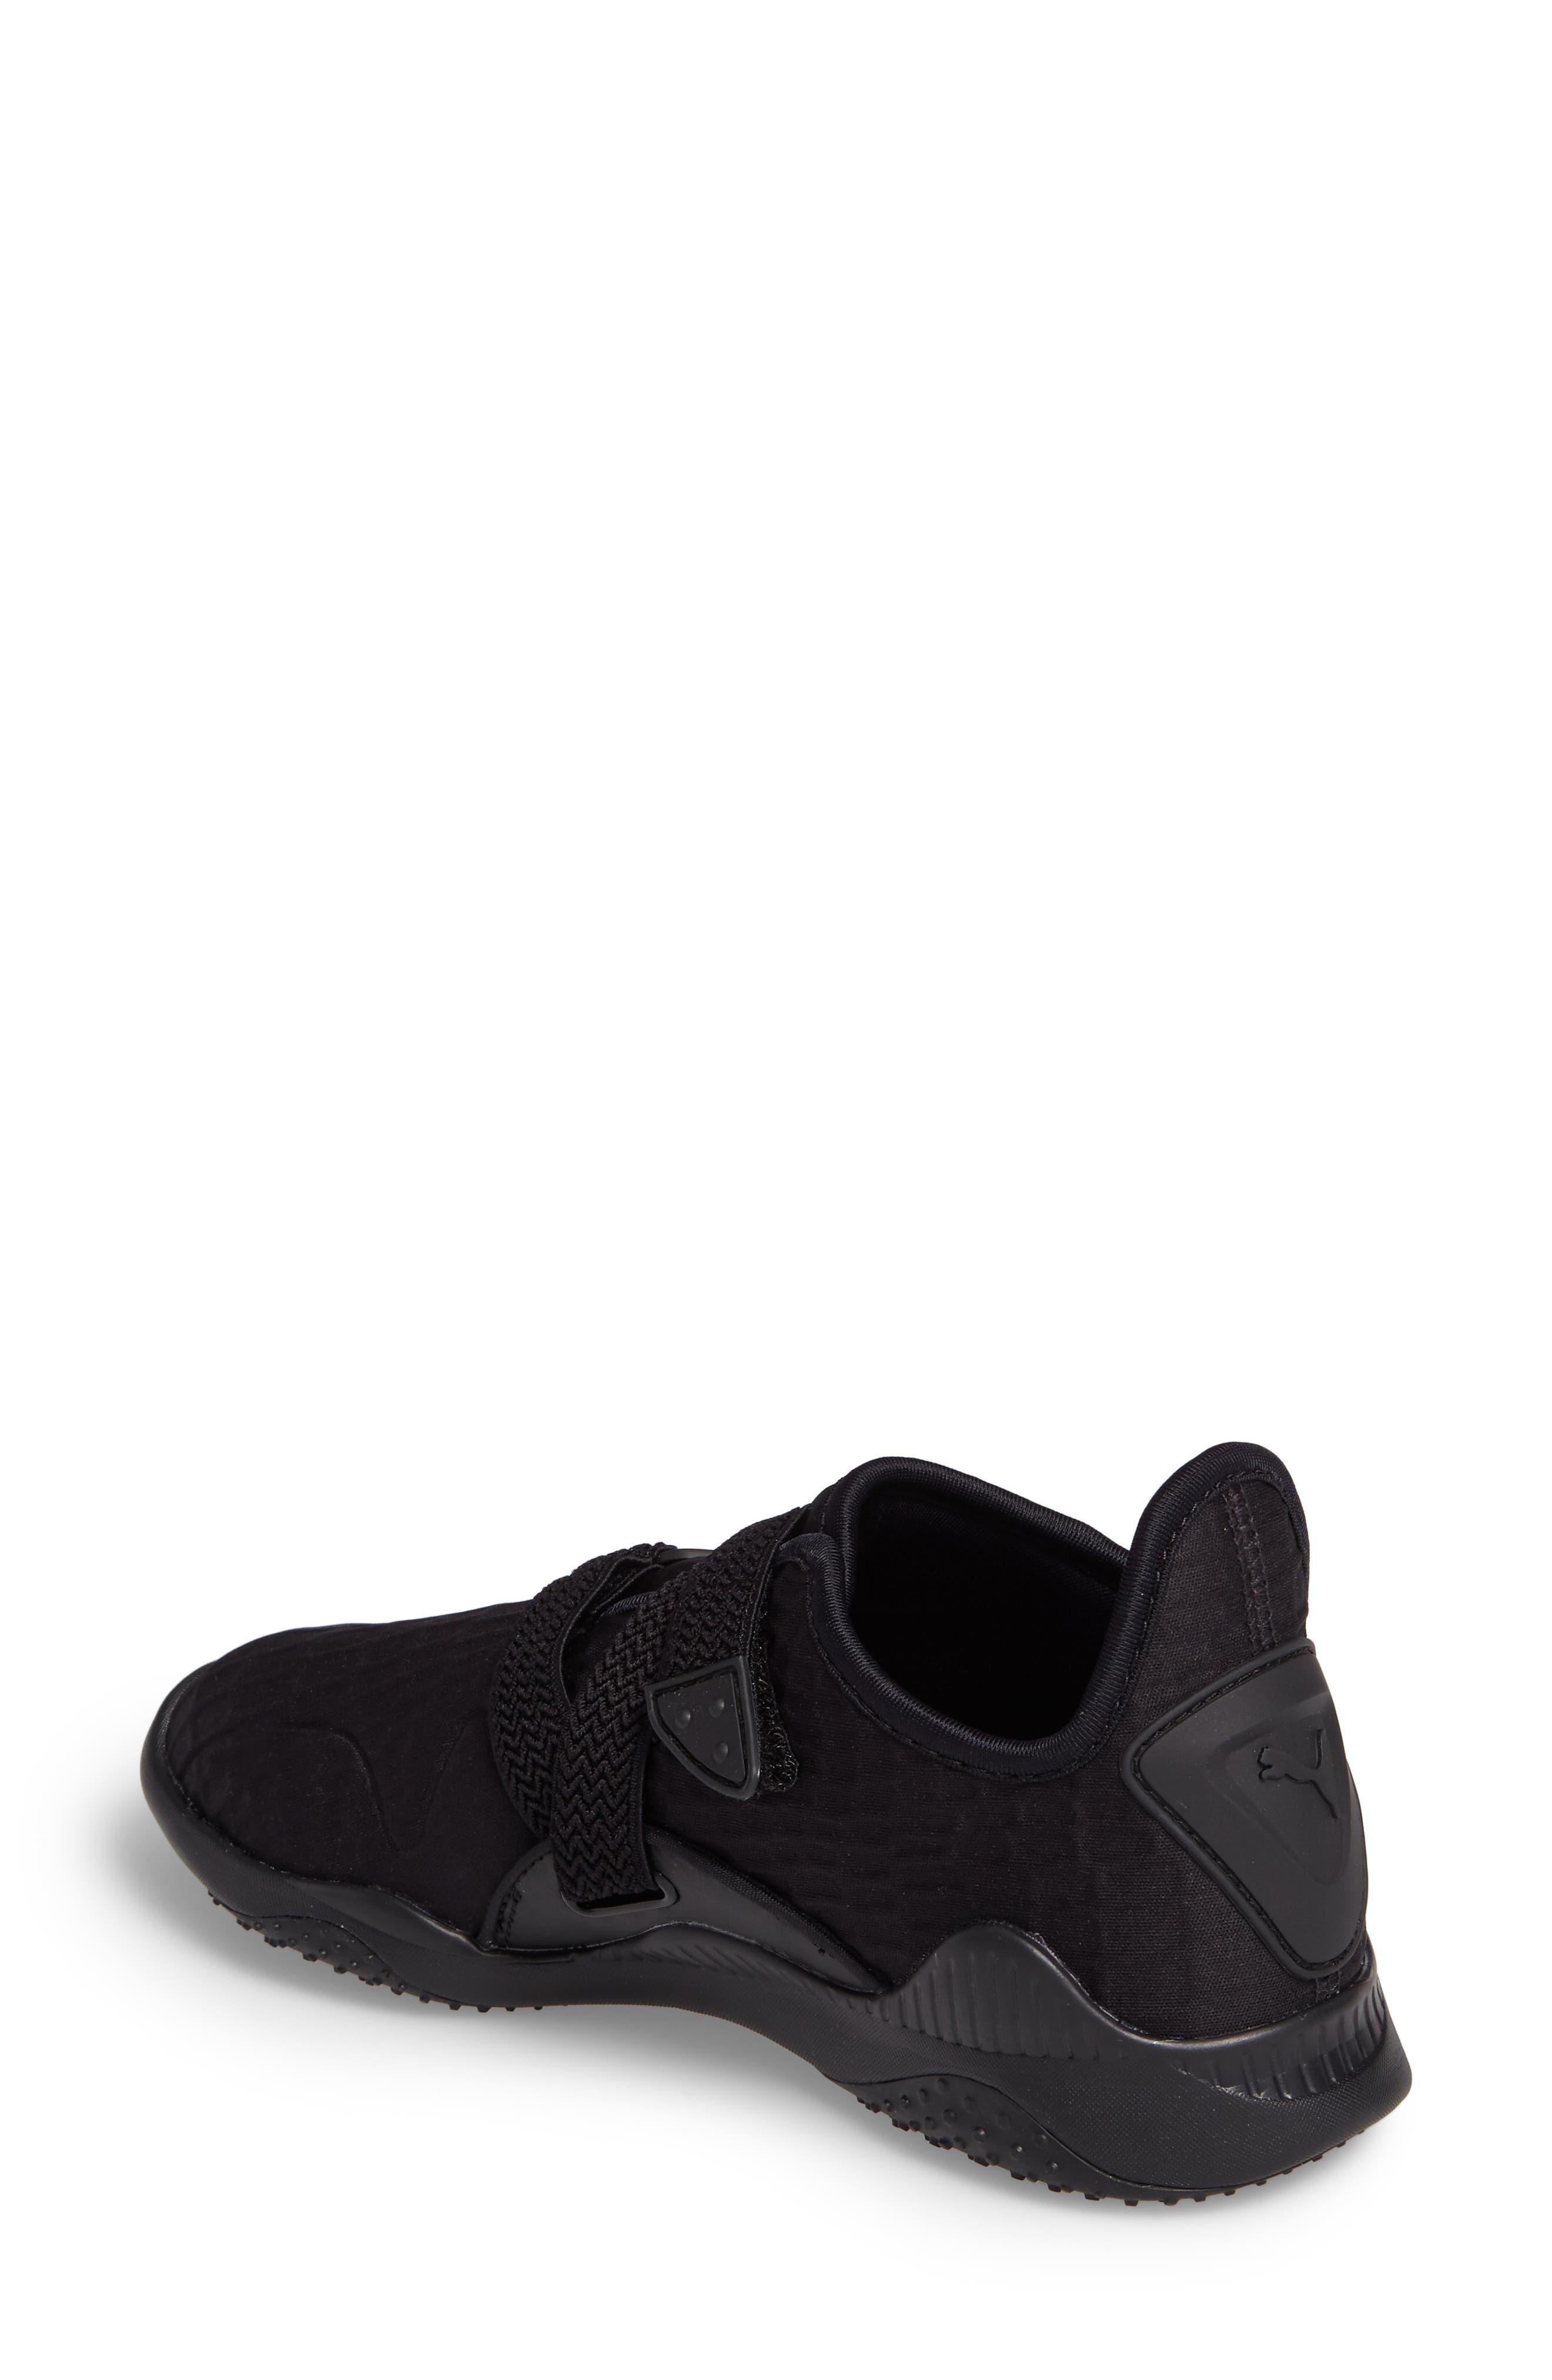 Mostro Fashion Sneaker,                             Alternate thumbnail 2, color,                             Puma Black/ Puma Black